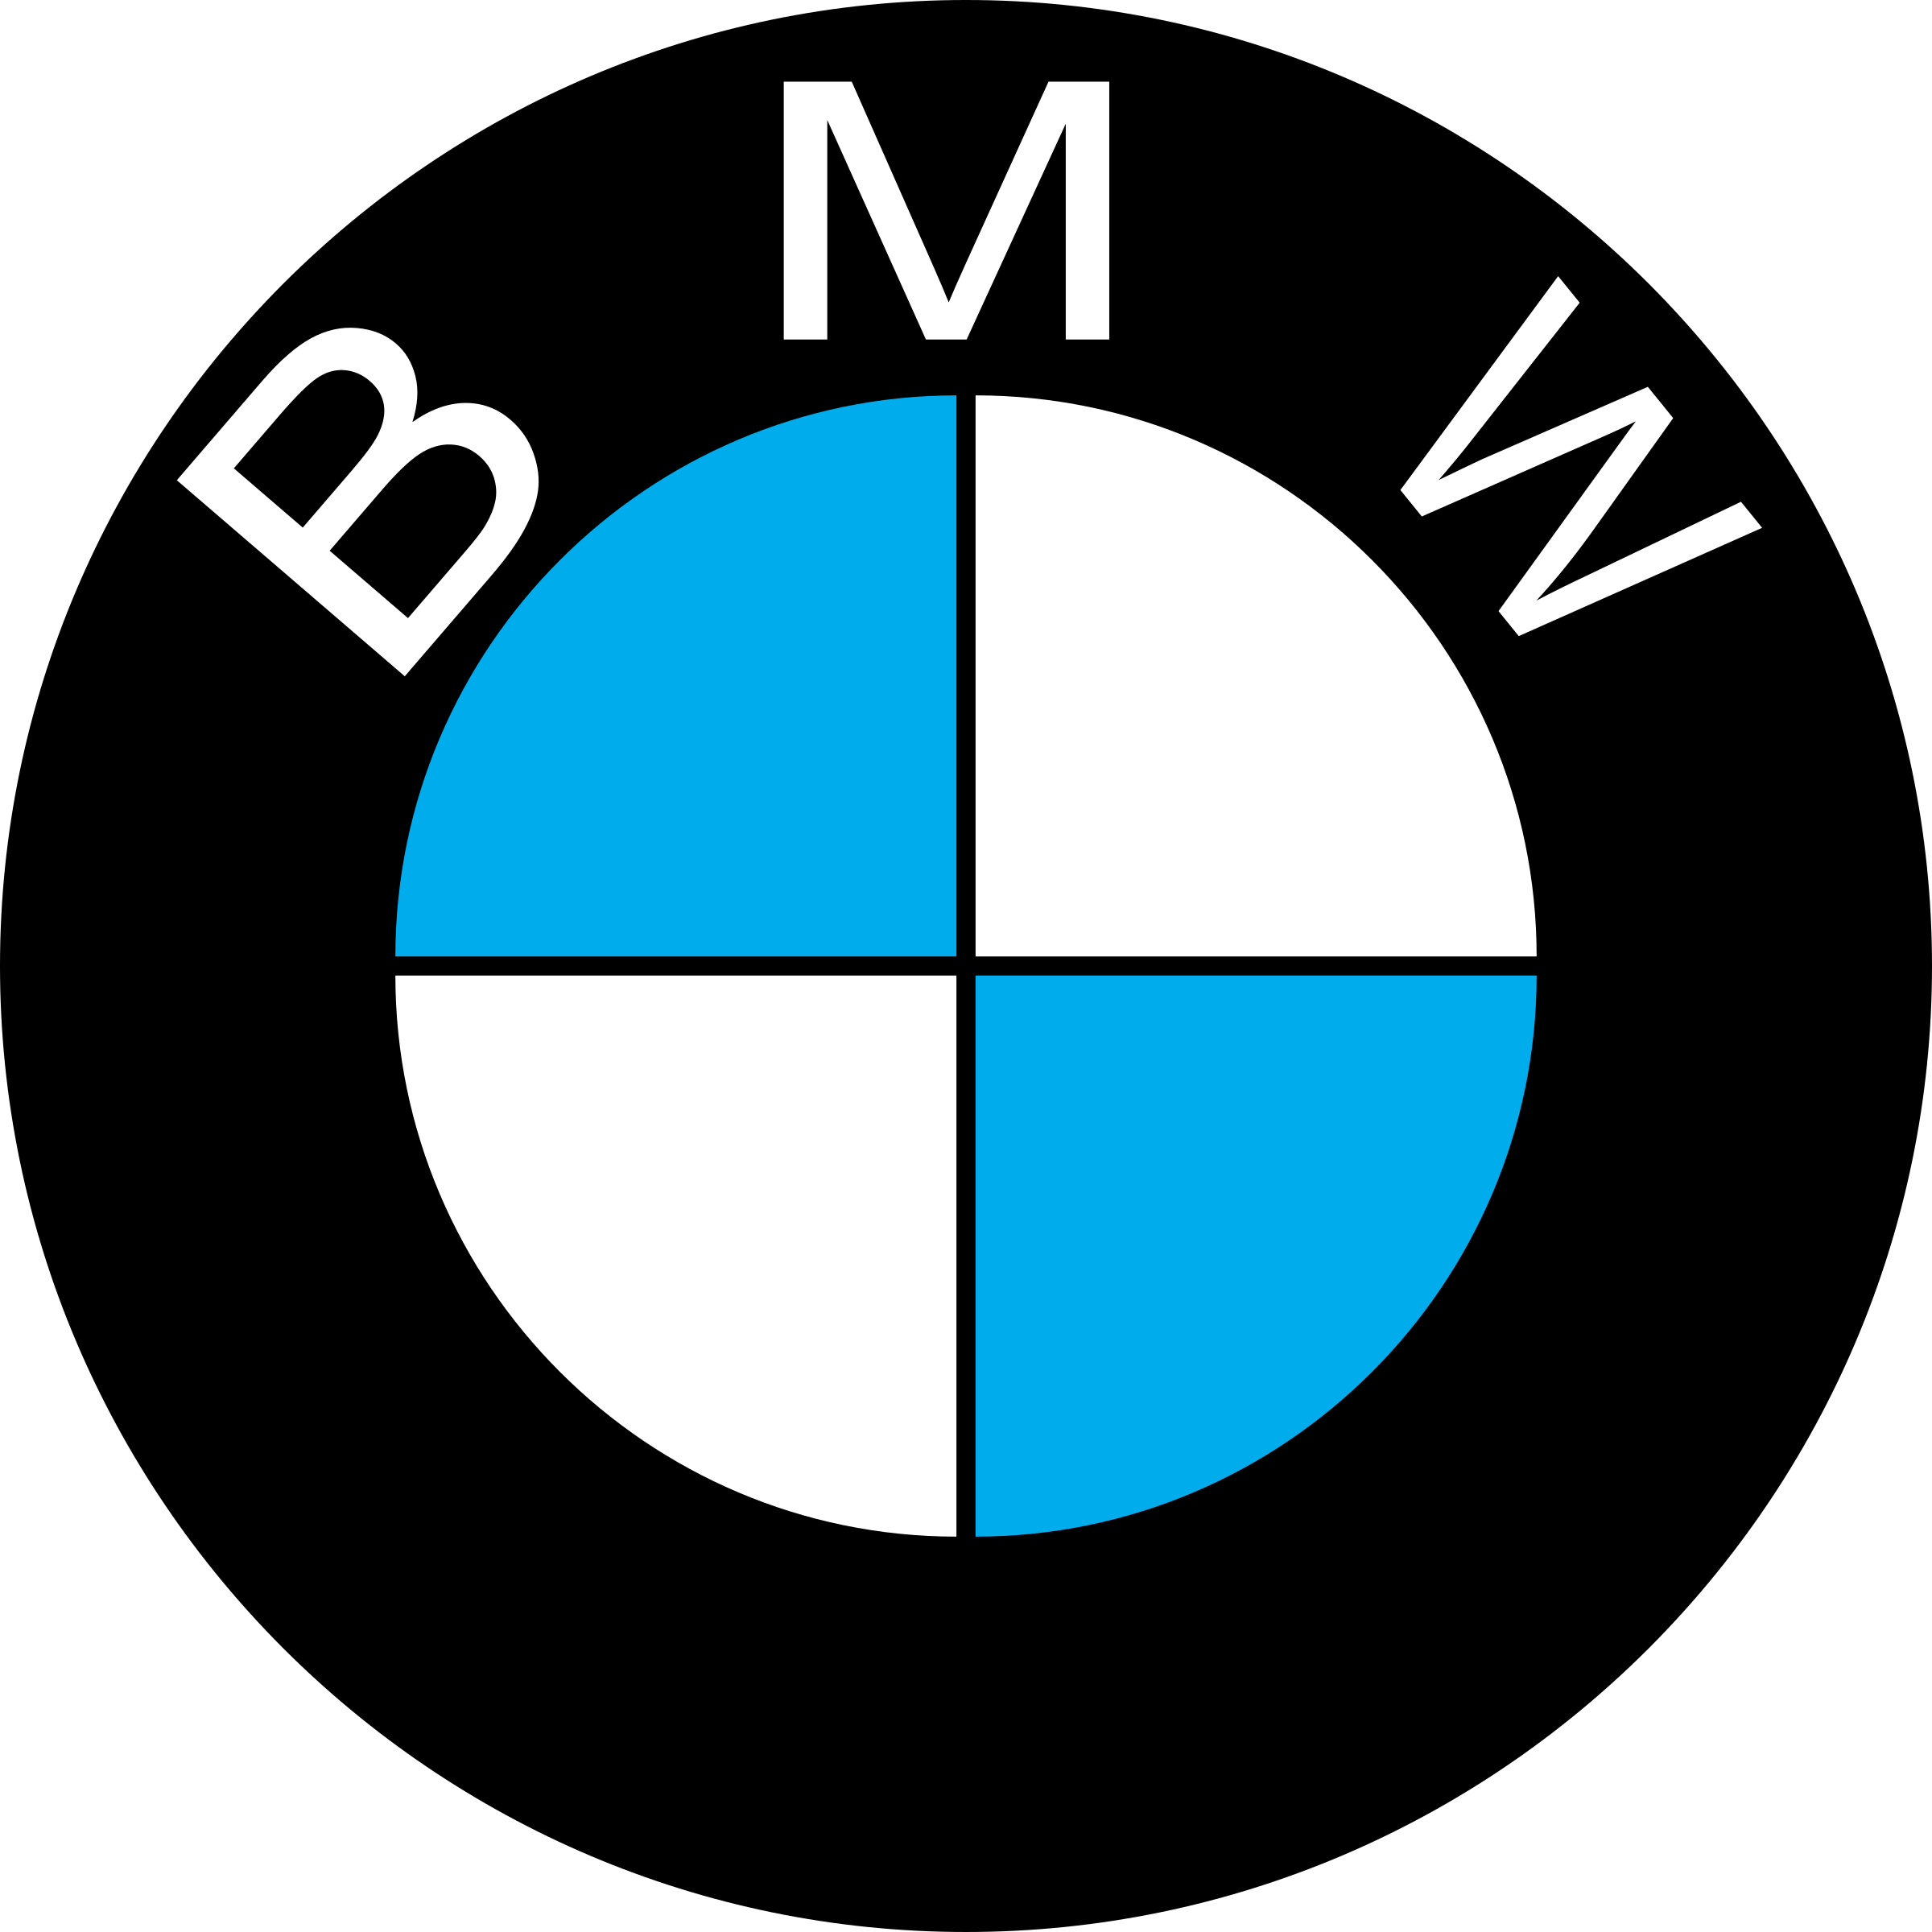 2400x2400 Bmw Logo Png Transparent Amp Svg Vector